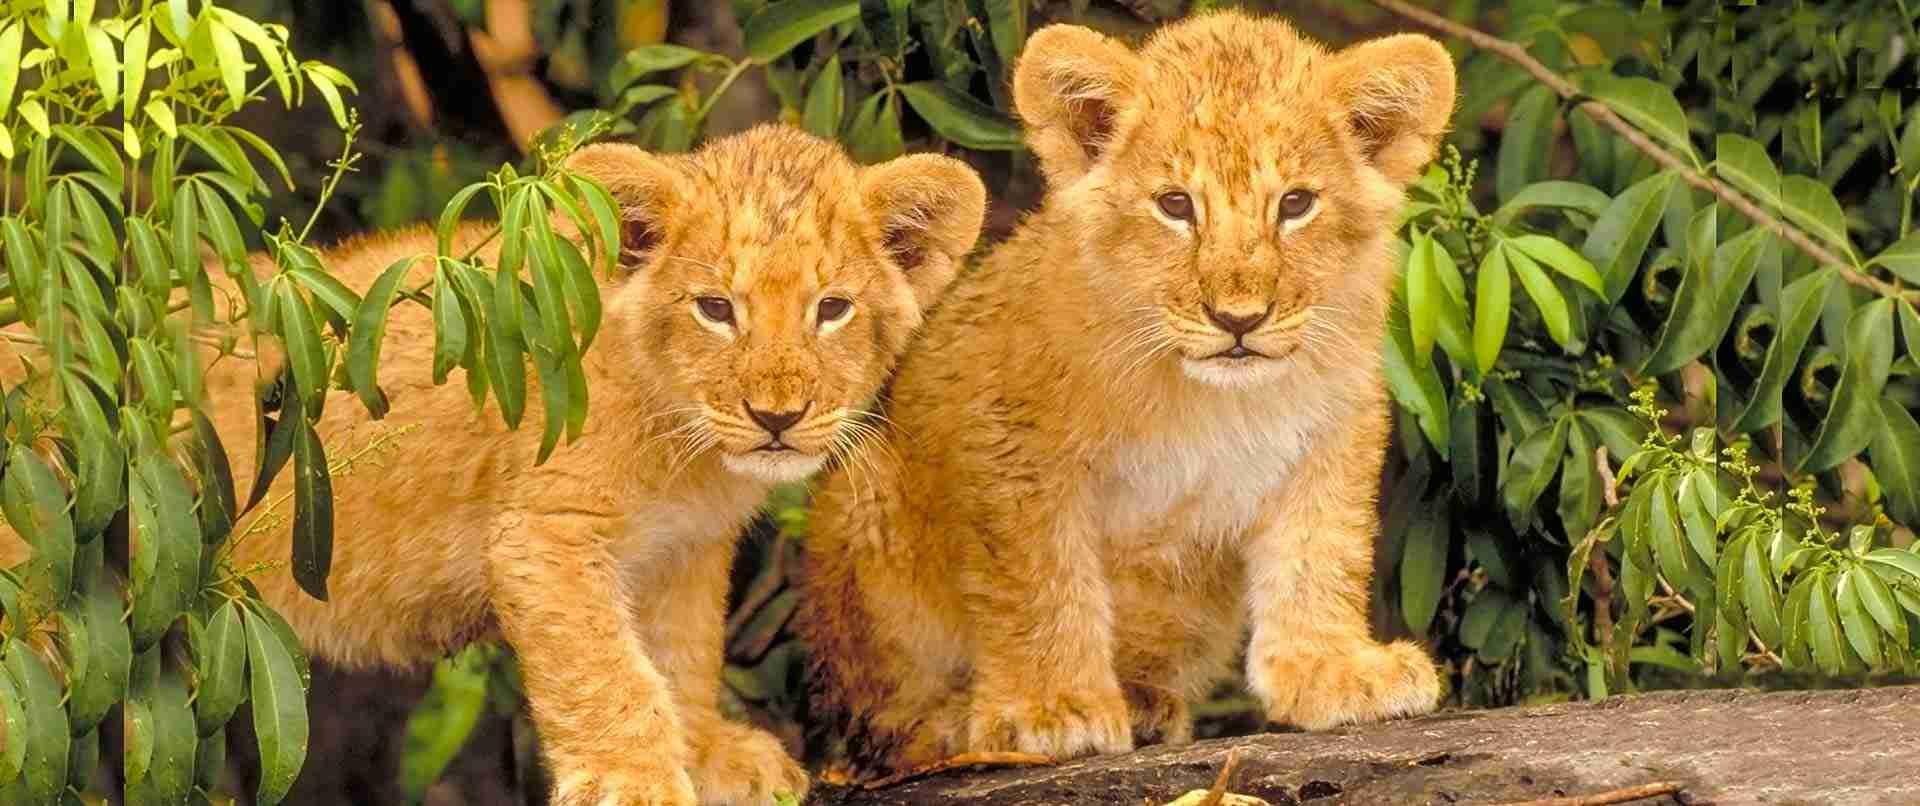 Lions en Tanzanie. Safari Tanzanie en promotion et pas cher